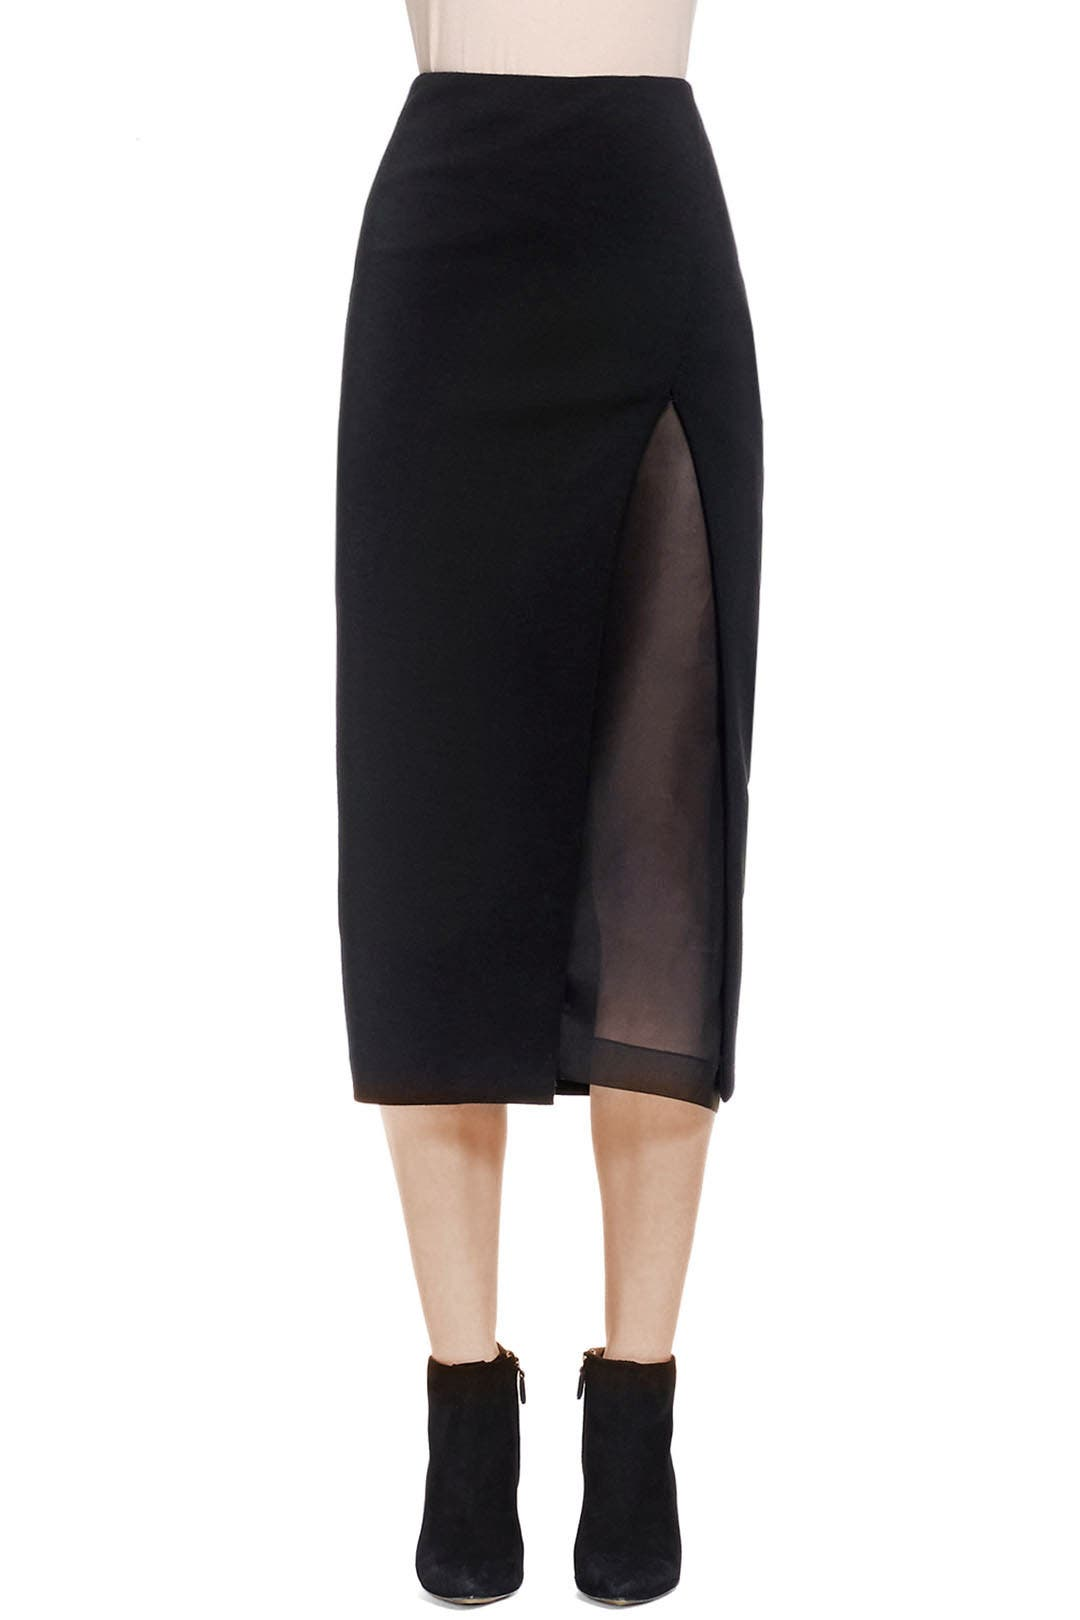 45ed6b7e468c84 Black Slit Shadow Pencil Skirt by Donna Karan New York for $180 | Rent the  Runway